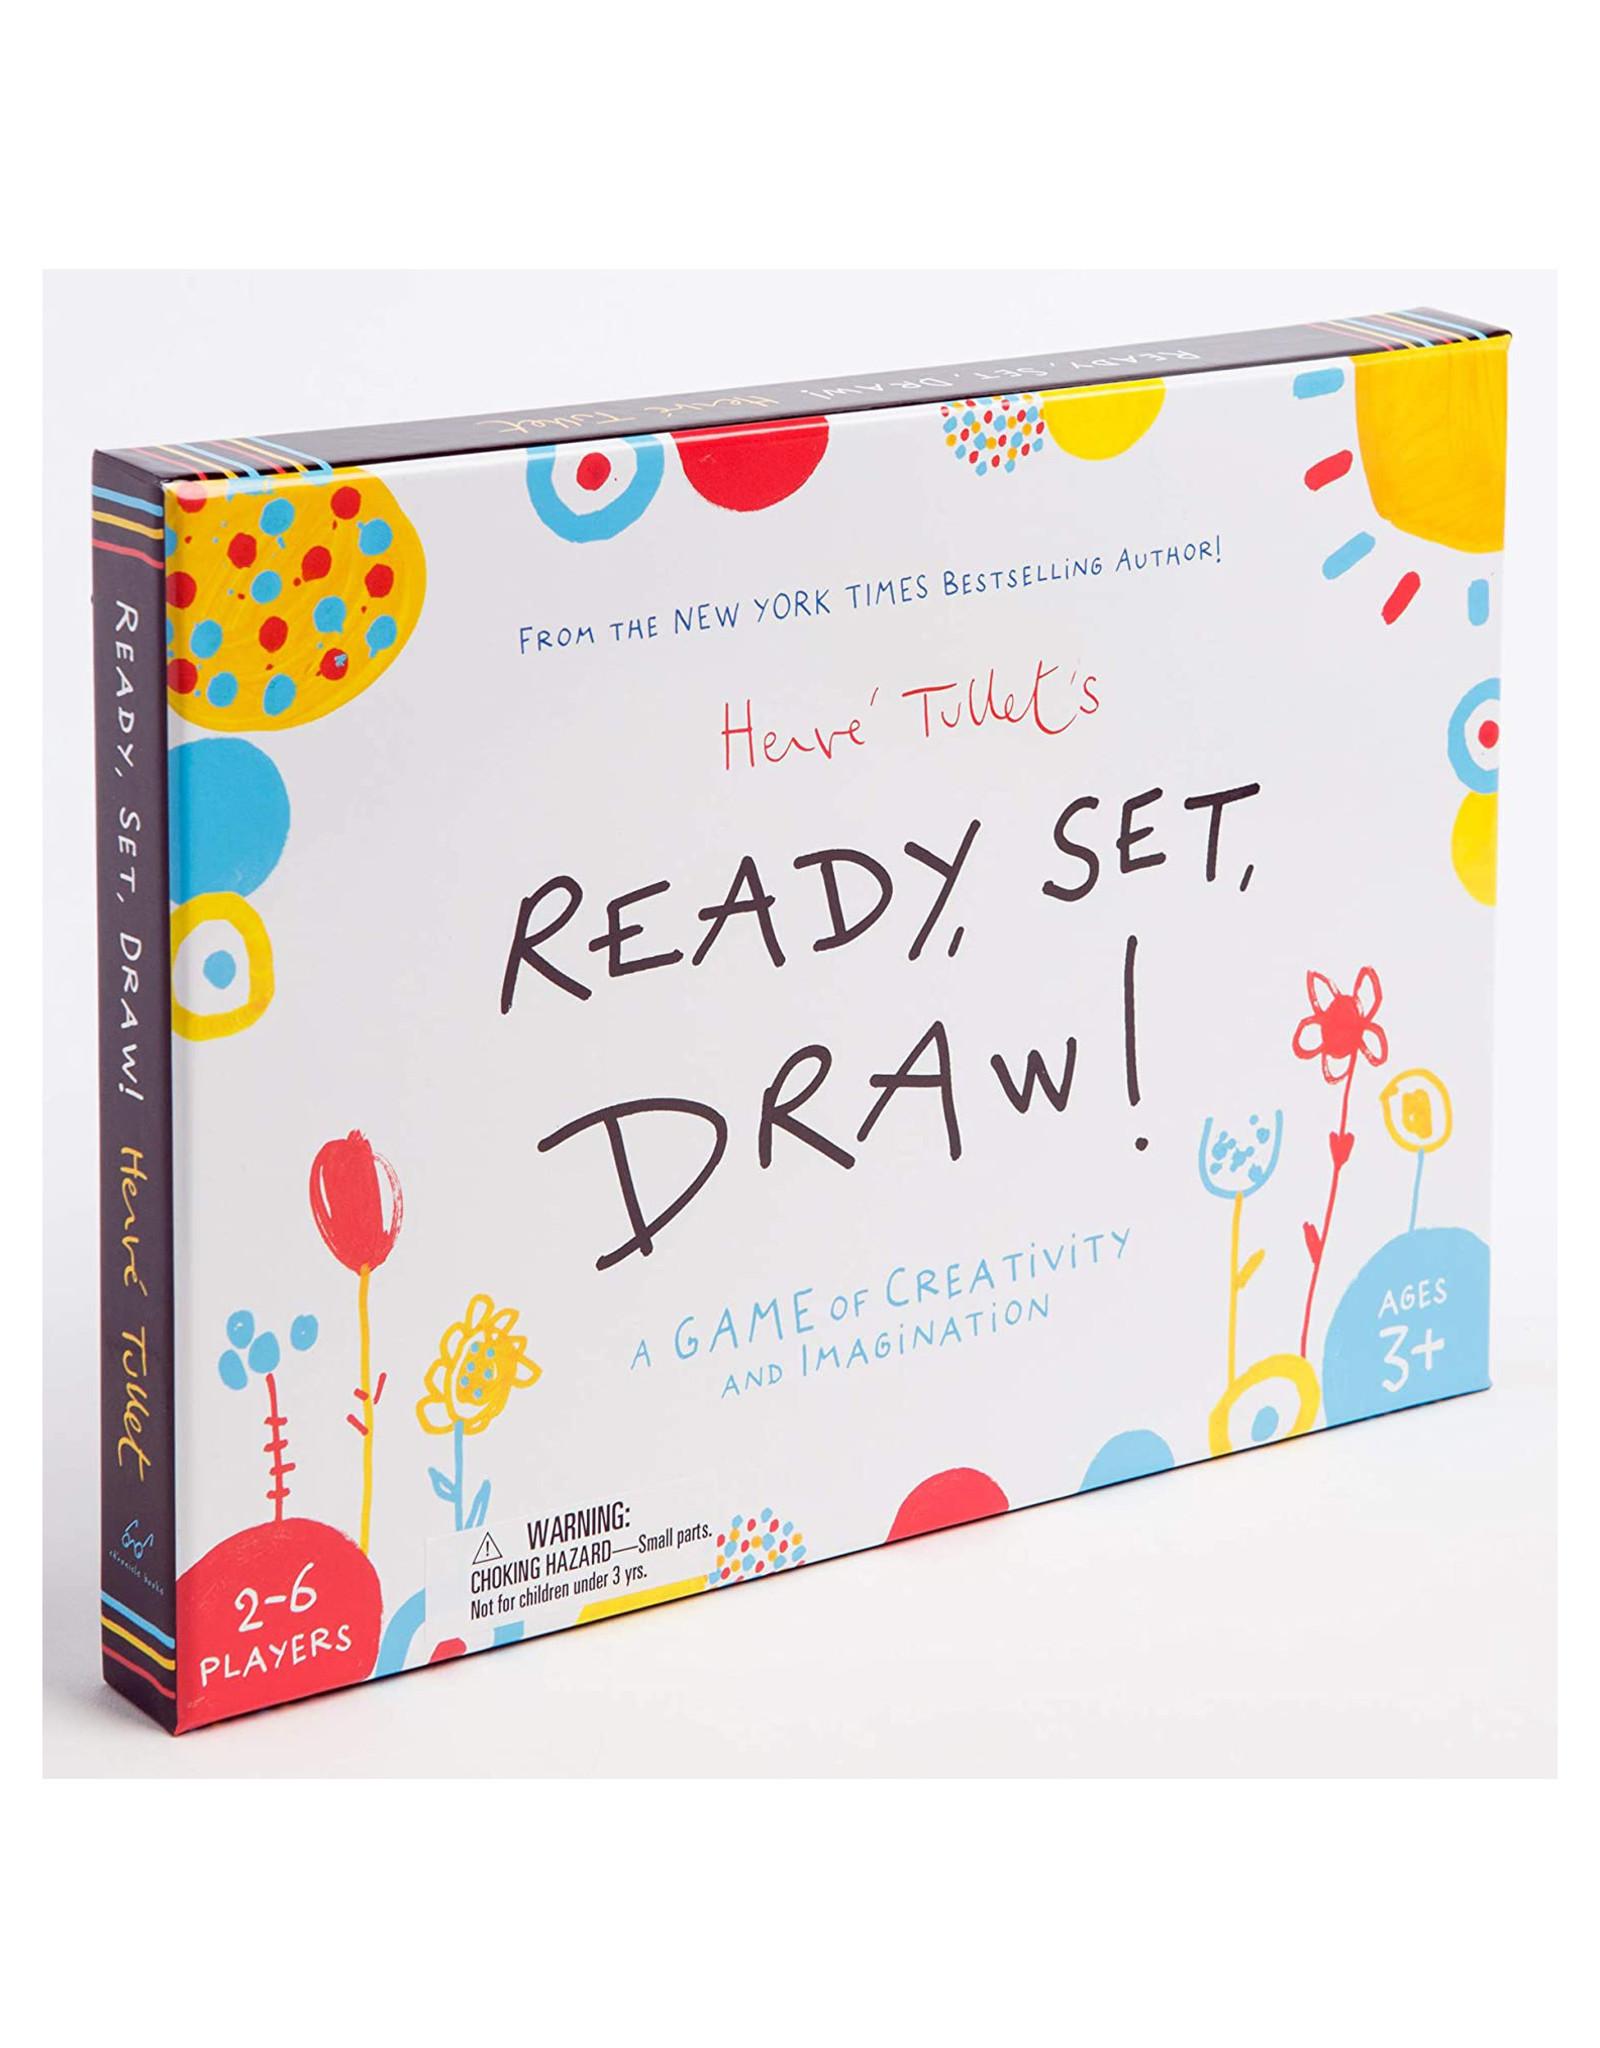 Ready, Set, Draw!